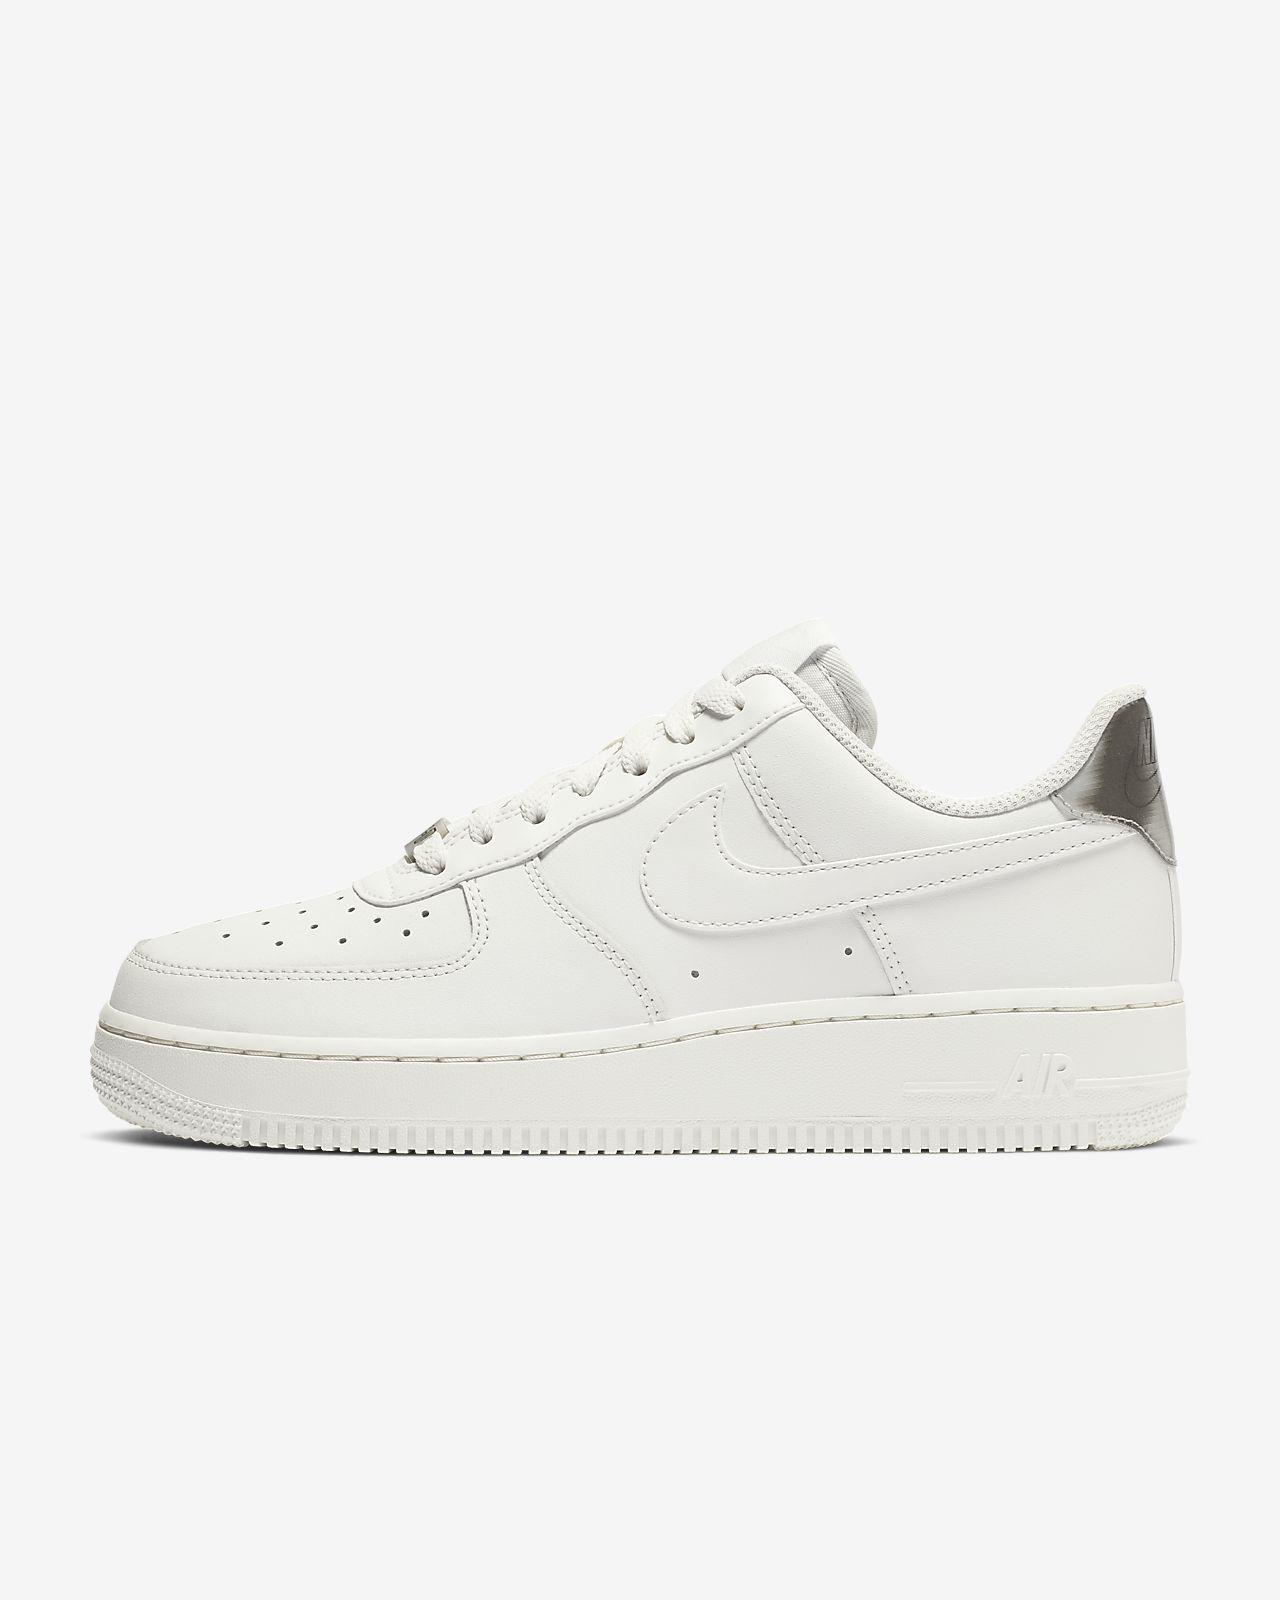 buy online f53eb 81272 ... Sko Nike Air Force 1  07 Essential för kvinnor